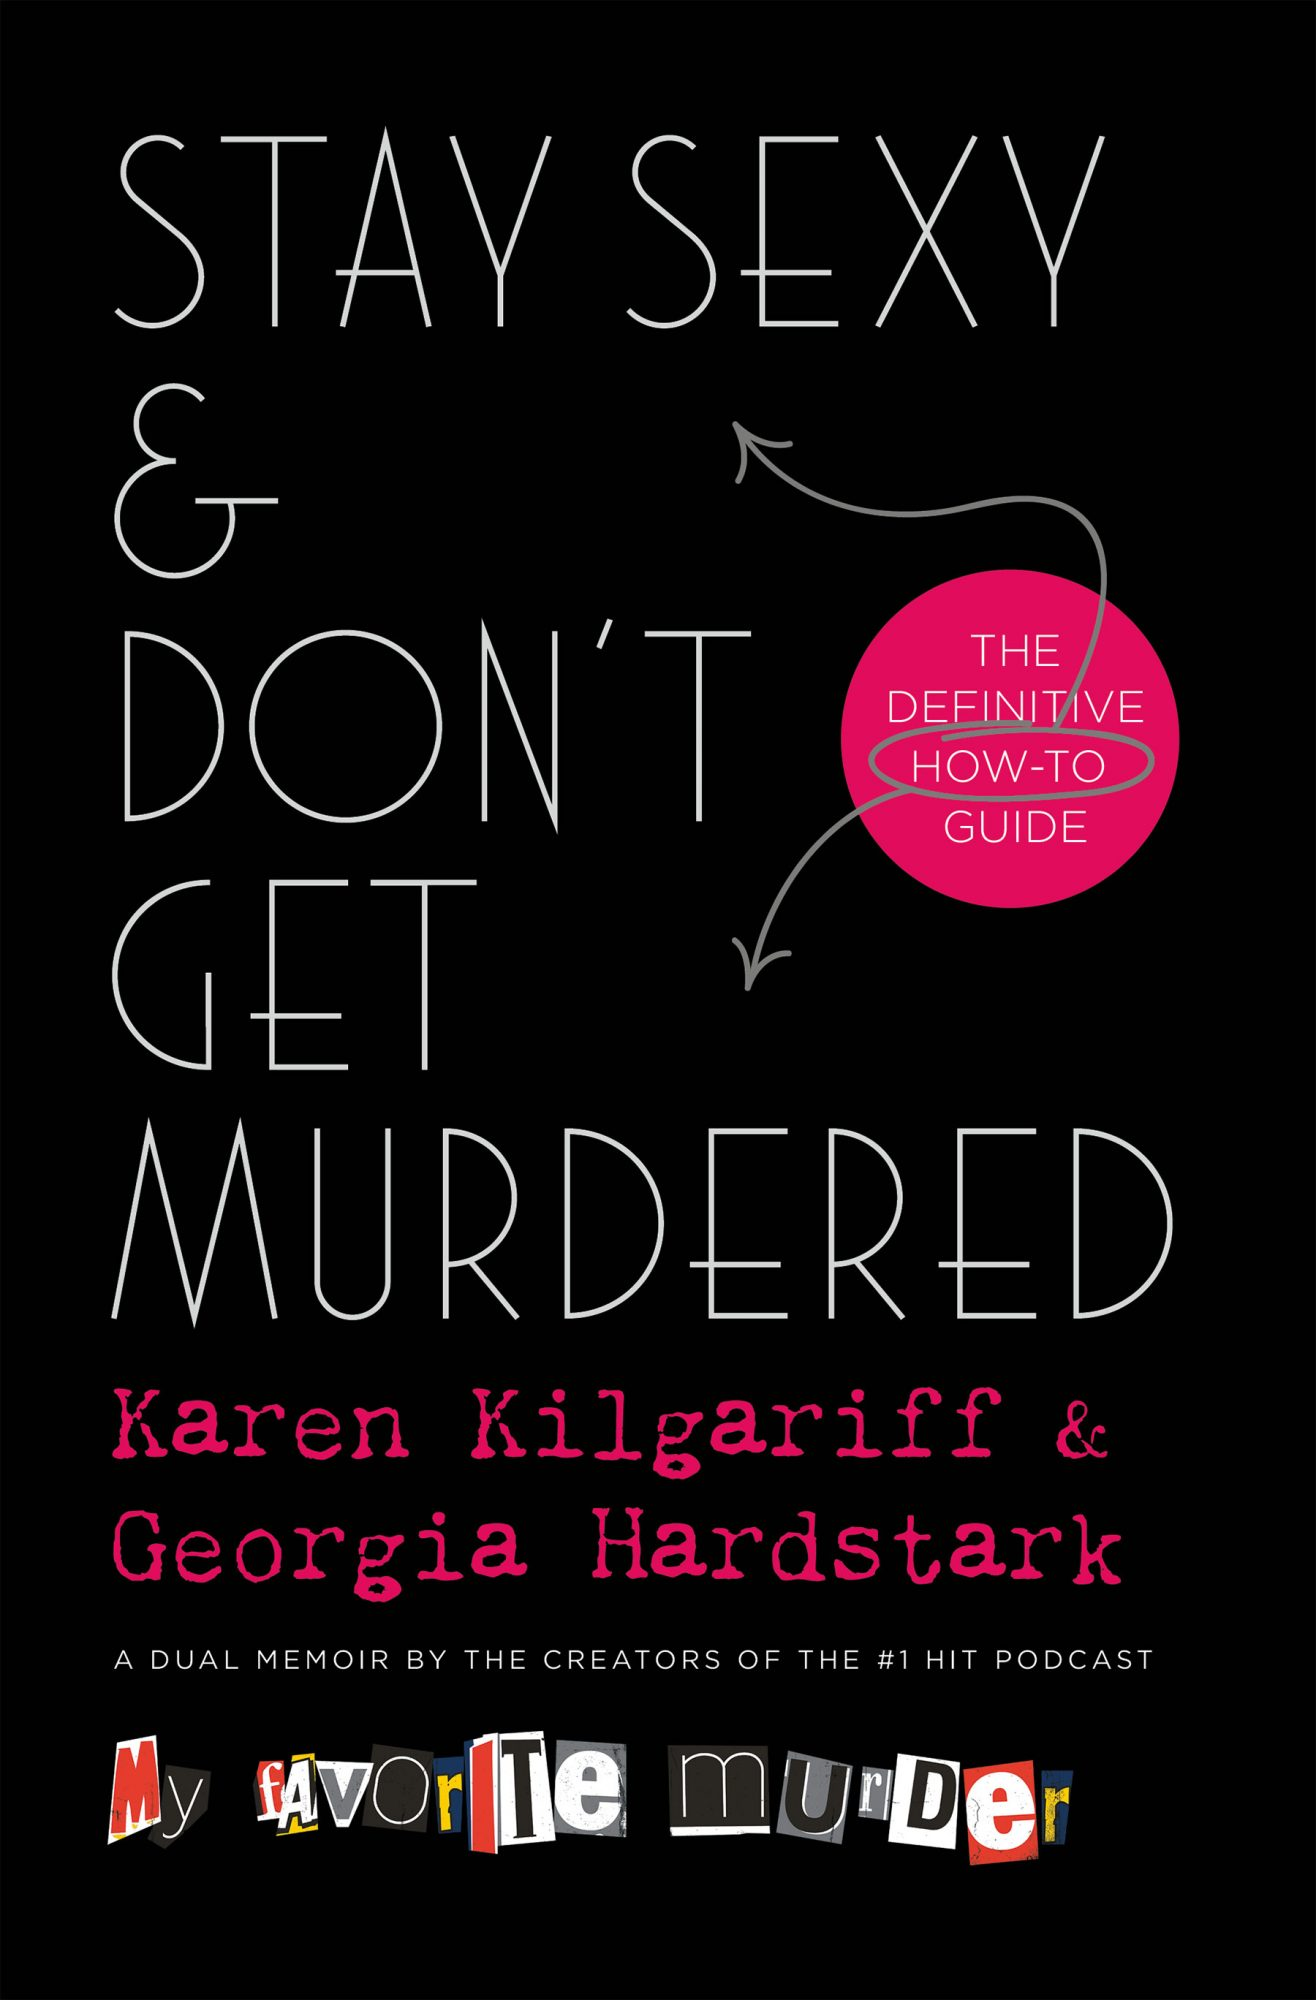 Stay Sexy & Don't Get Murdered by Karen Kilgariff and Georgia Hardstark